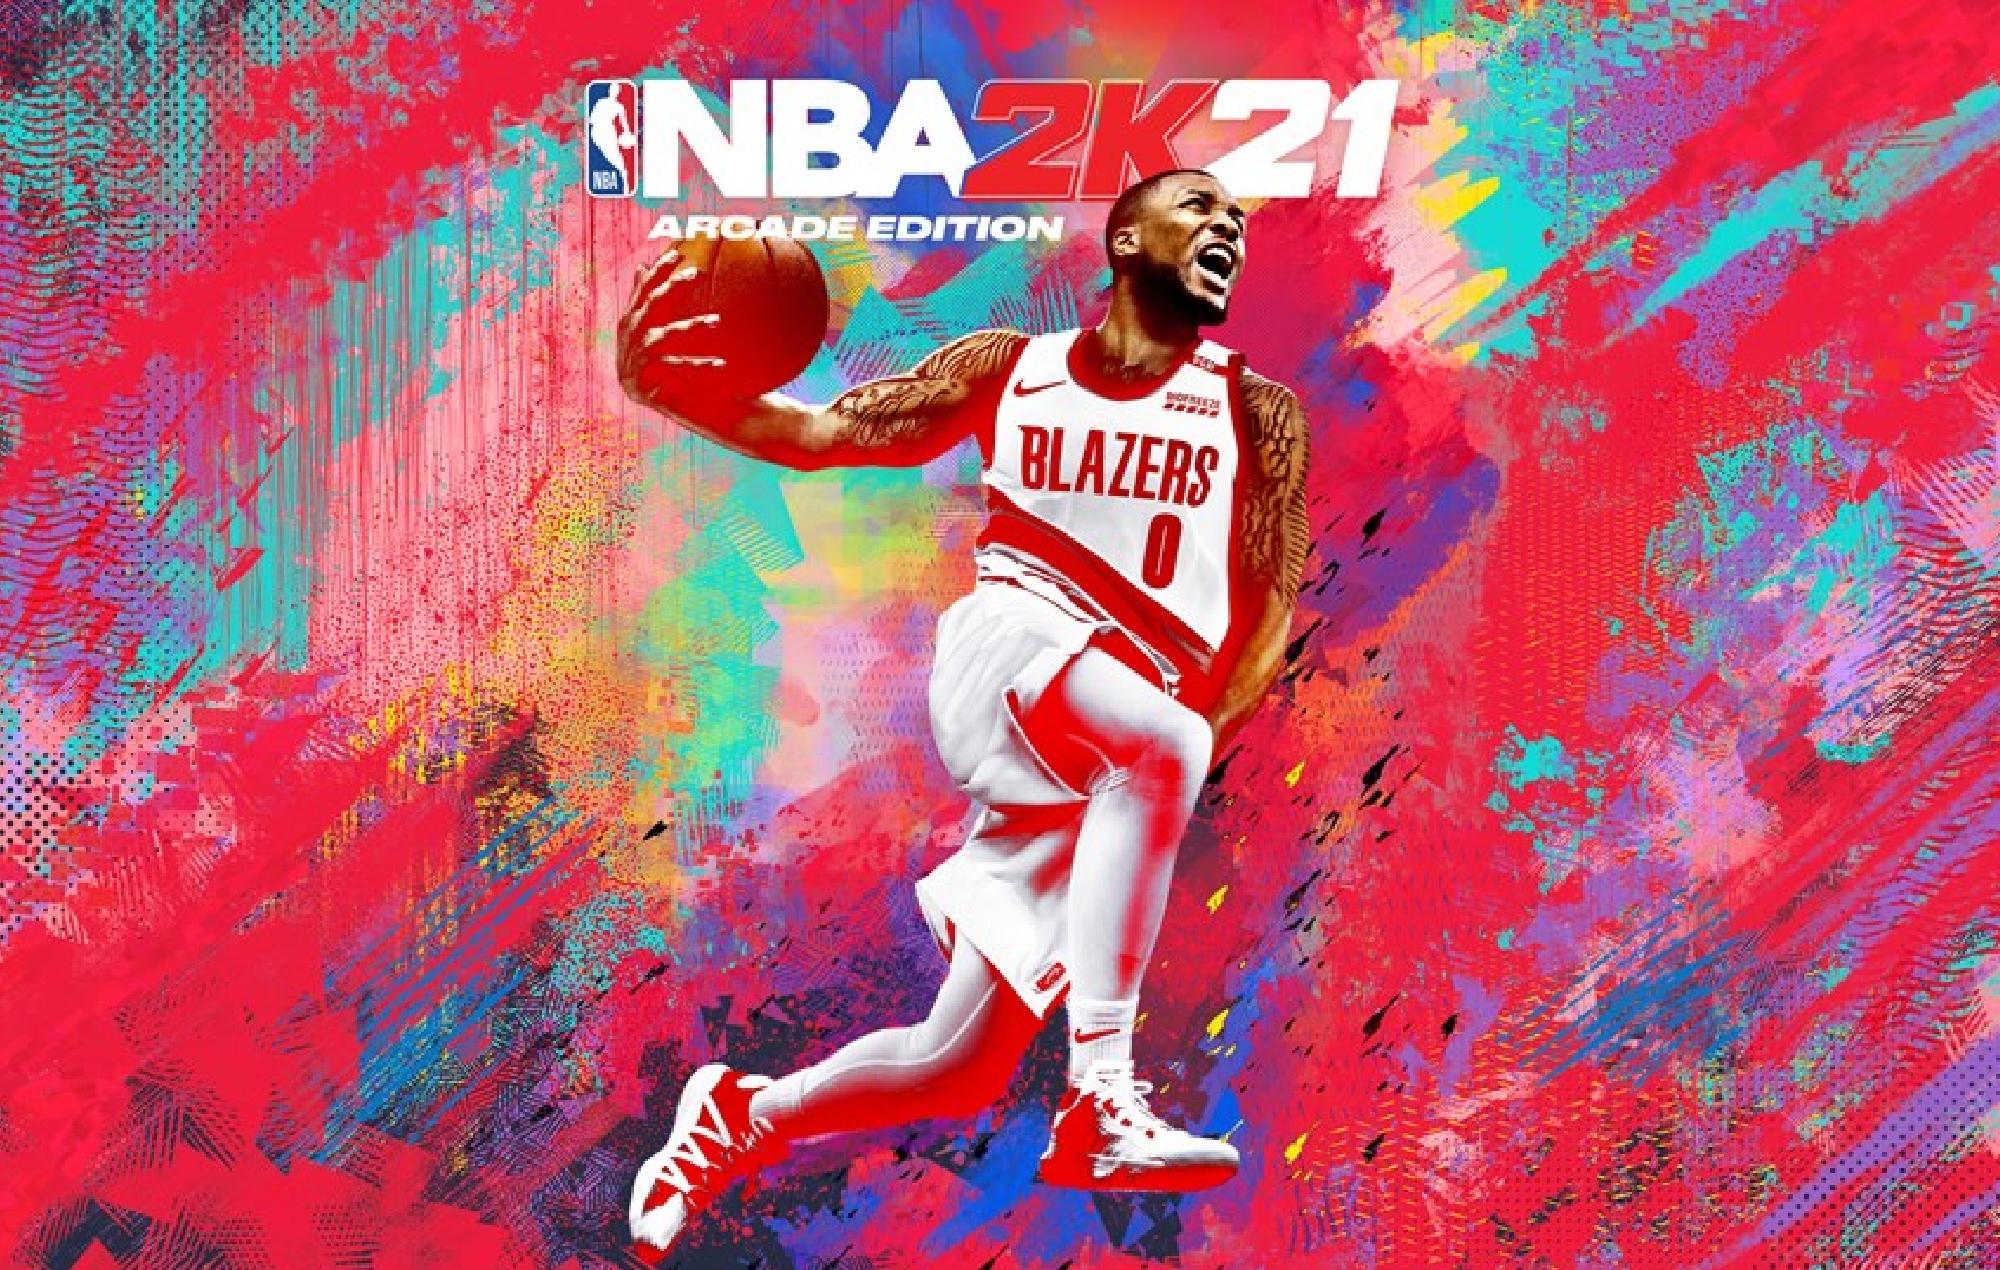 NBA 2K Arcade Edition